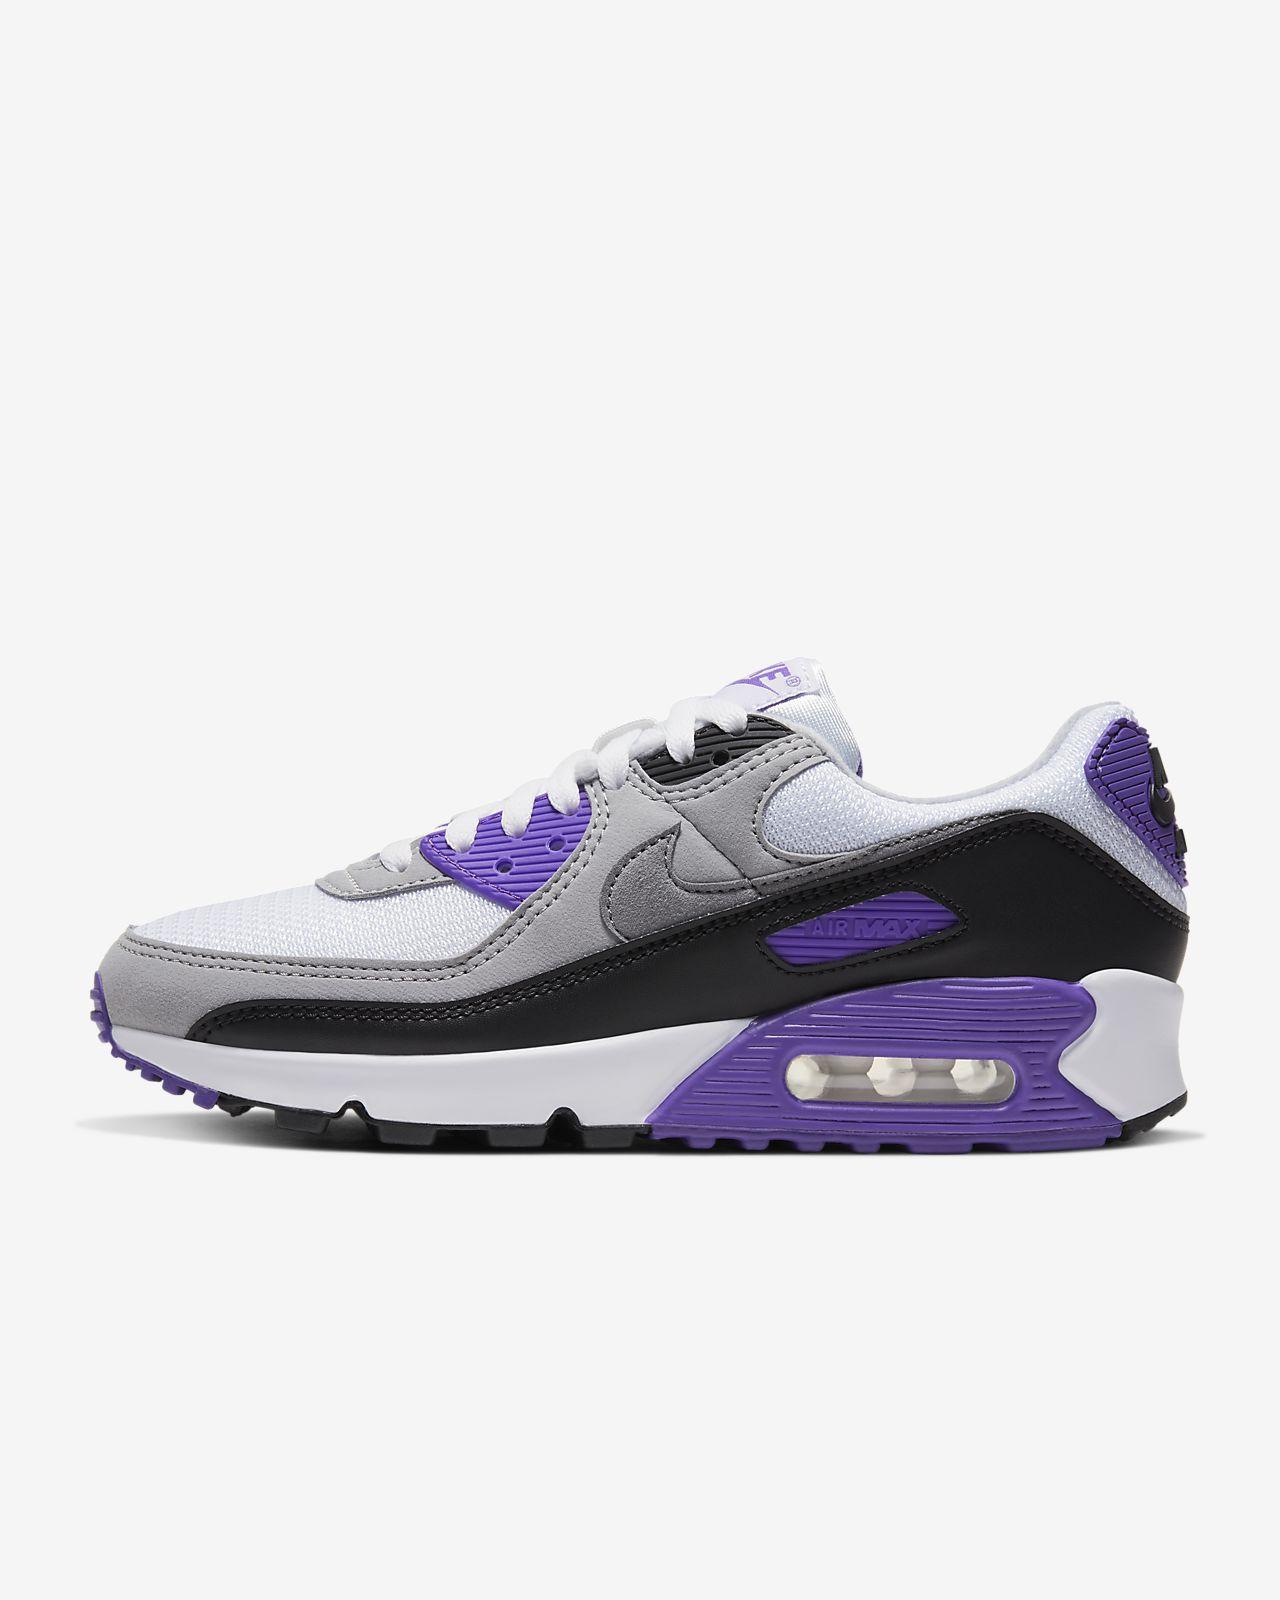 Nike Air Max 90 White Purple Grey Pink in 2020 | Nike air